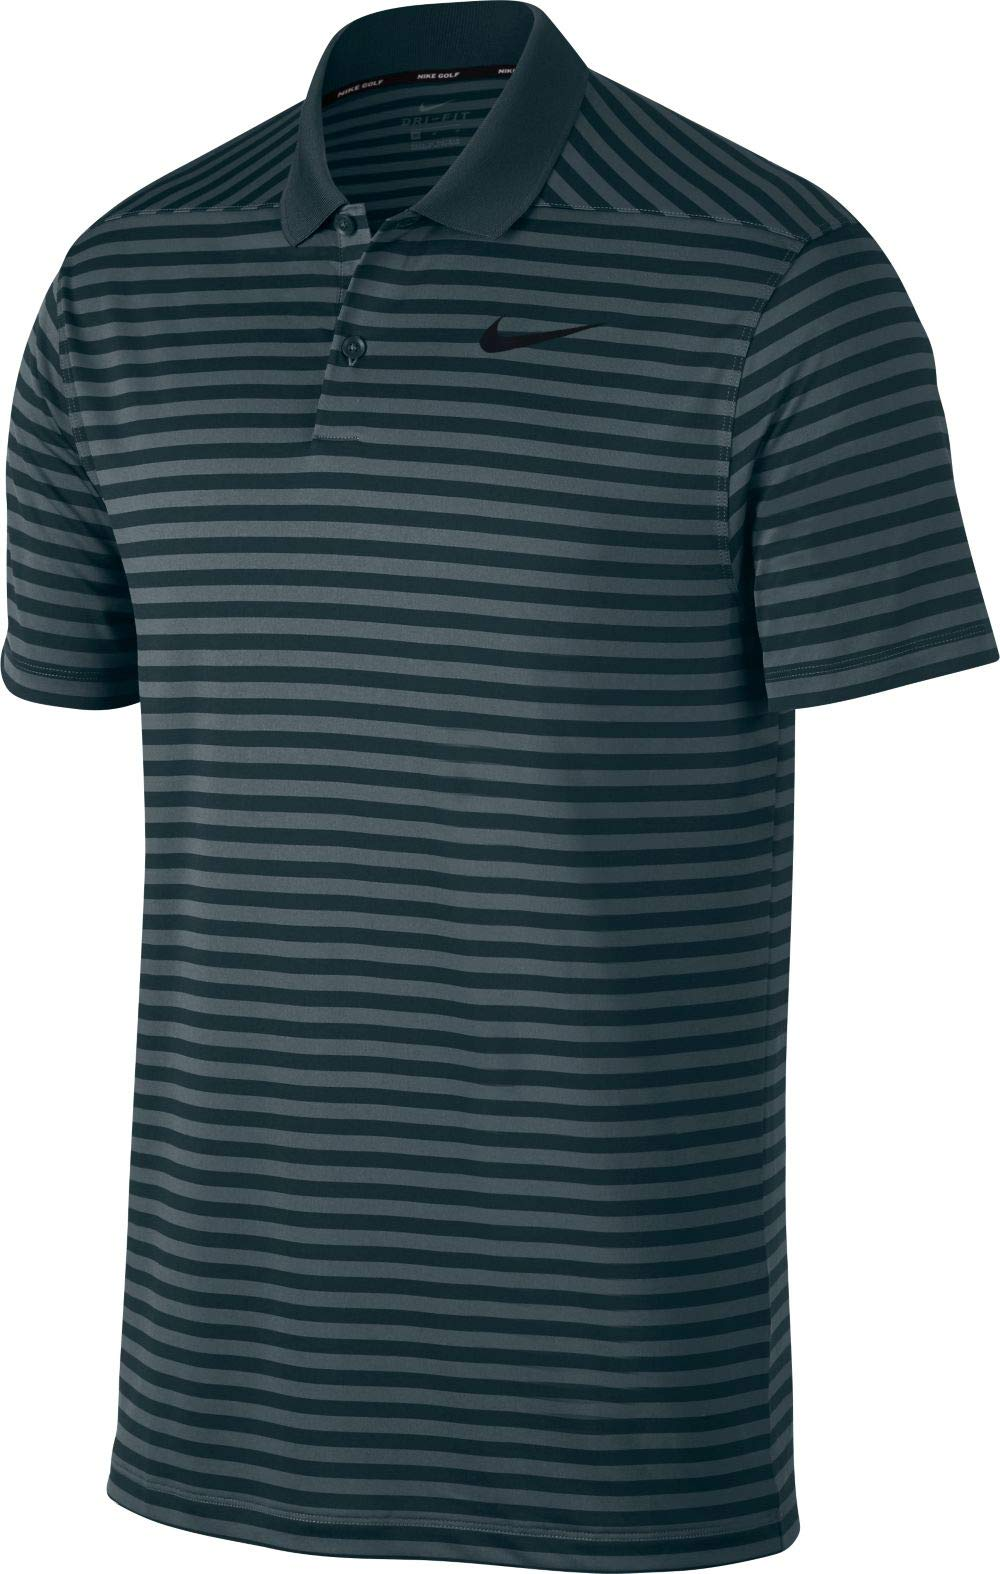 Nike Men's Dri Fit Victory Stripe LC Golf Polo (Faded Spruce/Midnight Spruce/Black, Small)